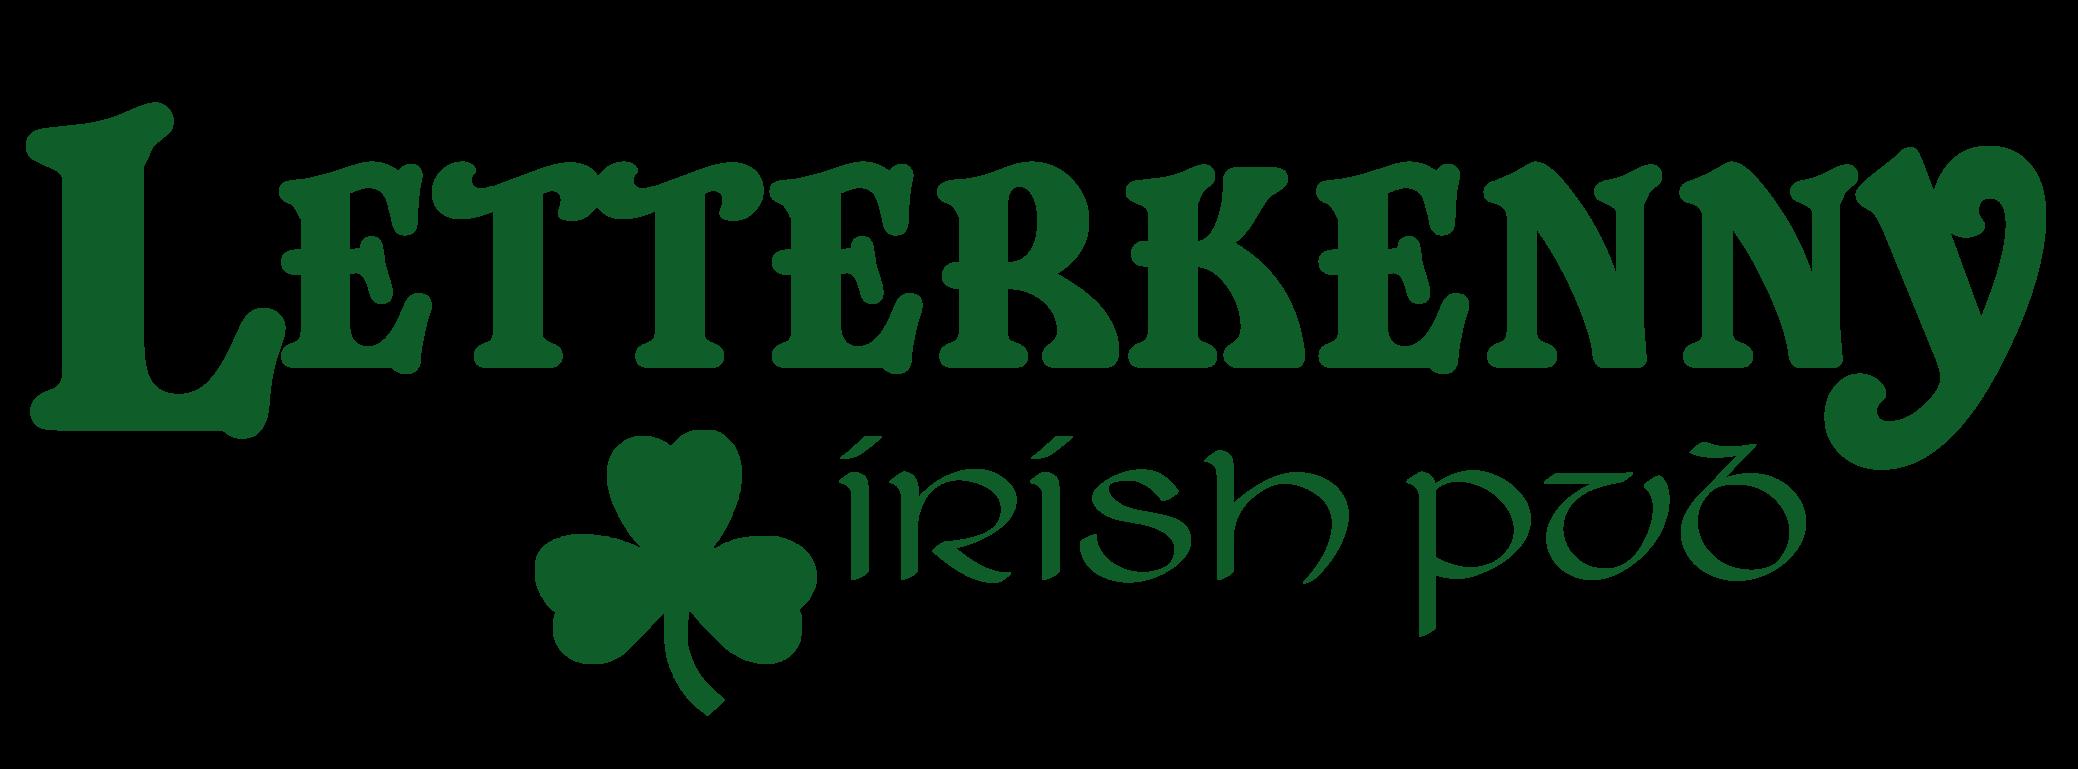 Letterkenny Irish Pub